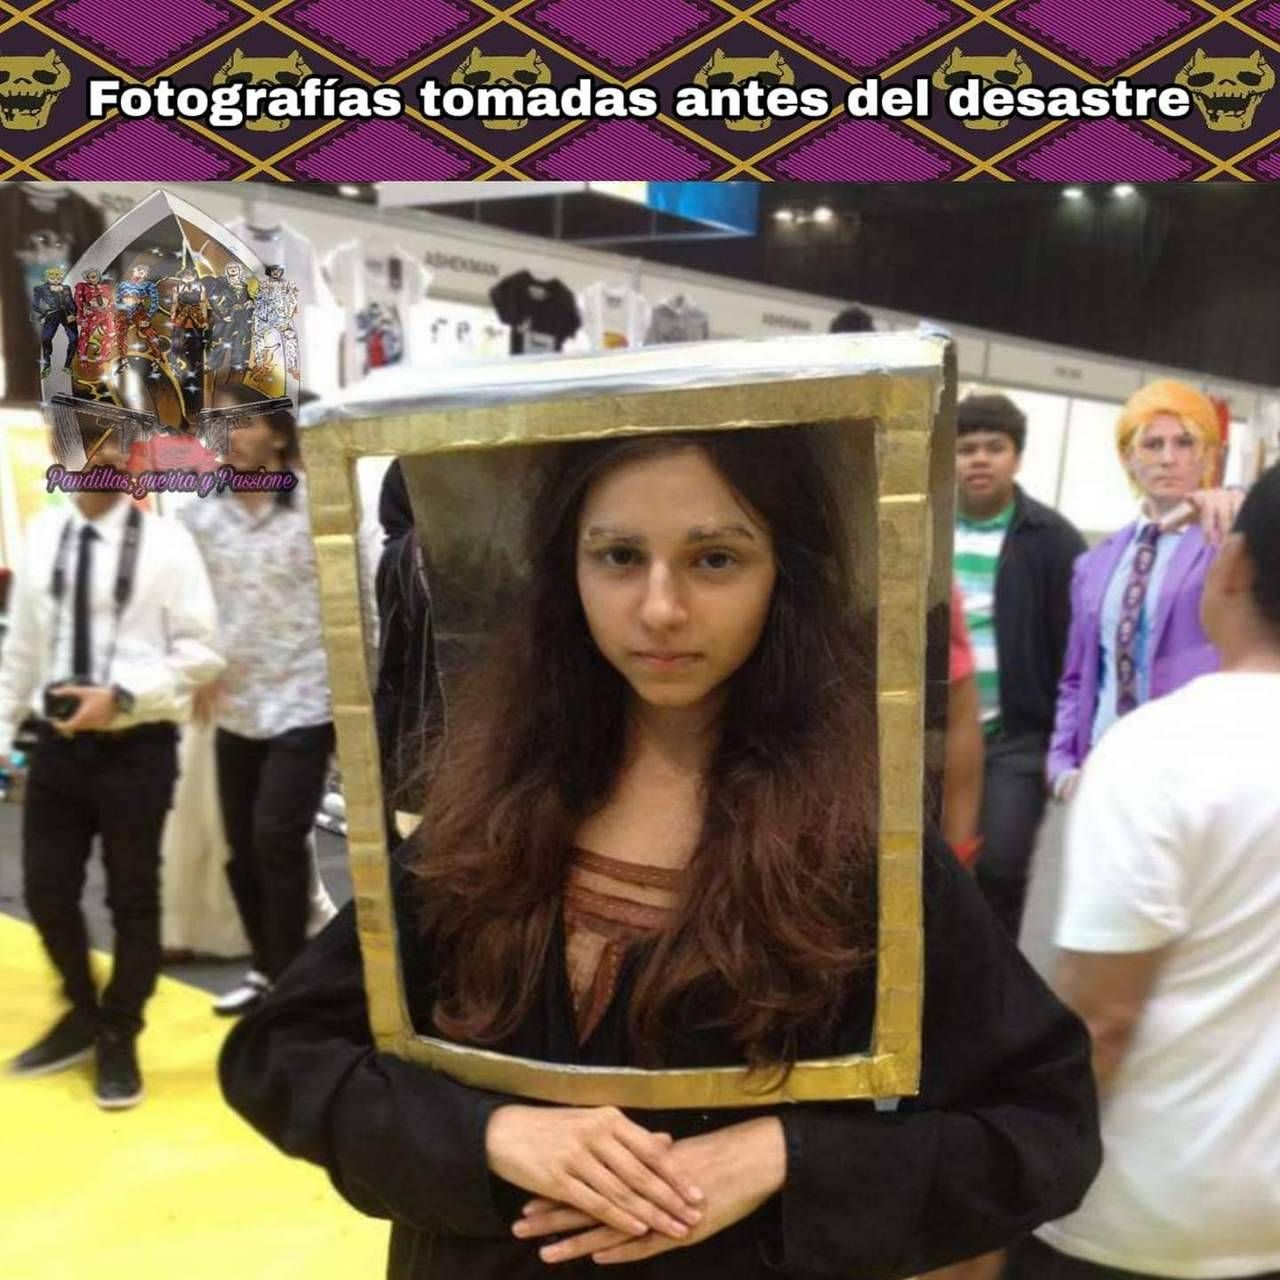 """Photos taken seconds before disaster"" Jojo bizarre"